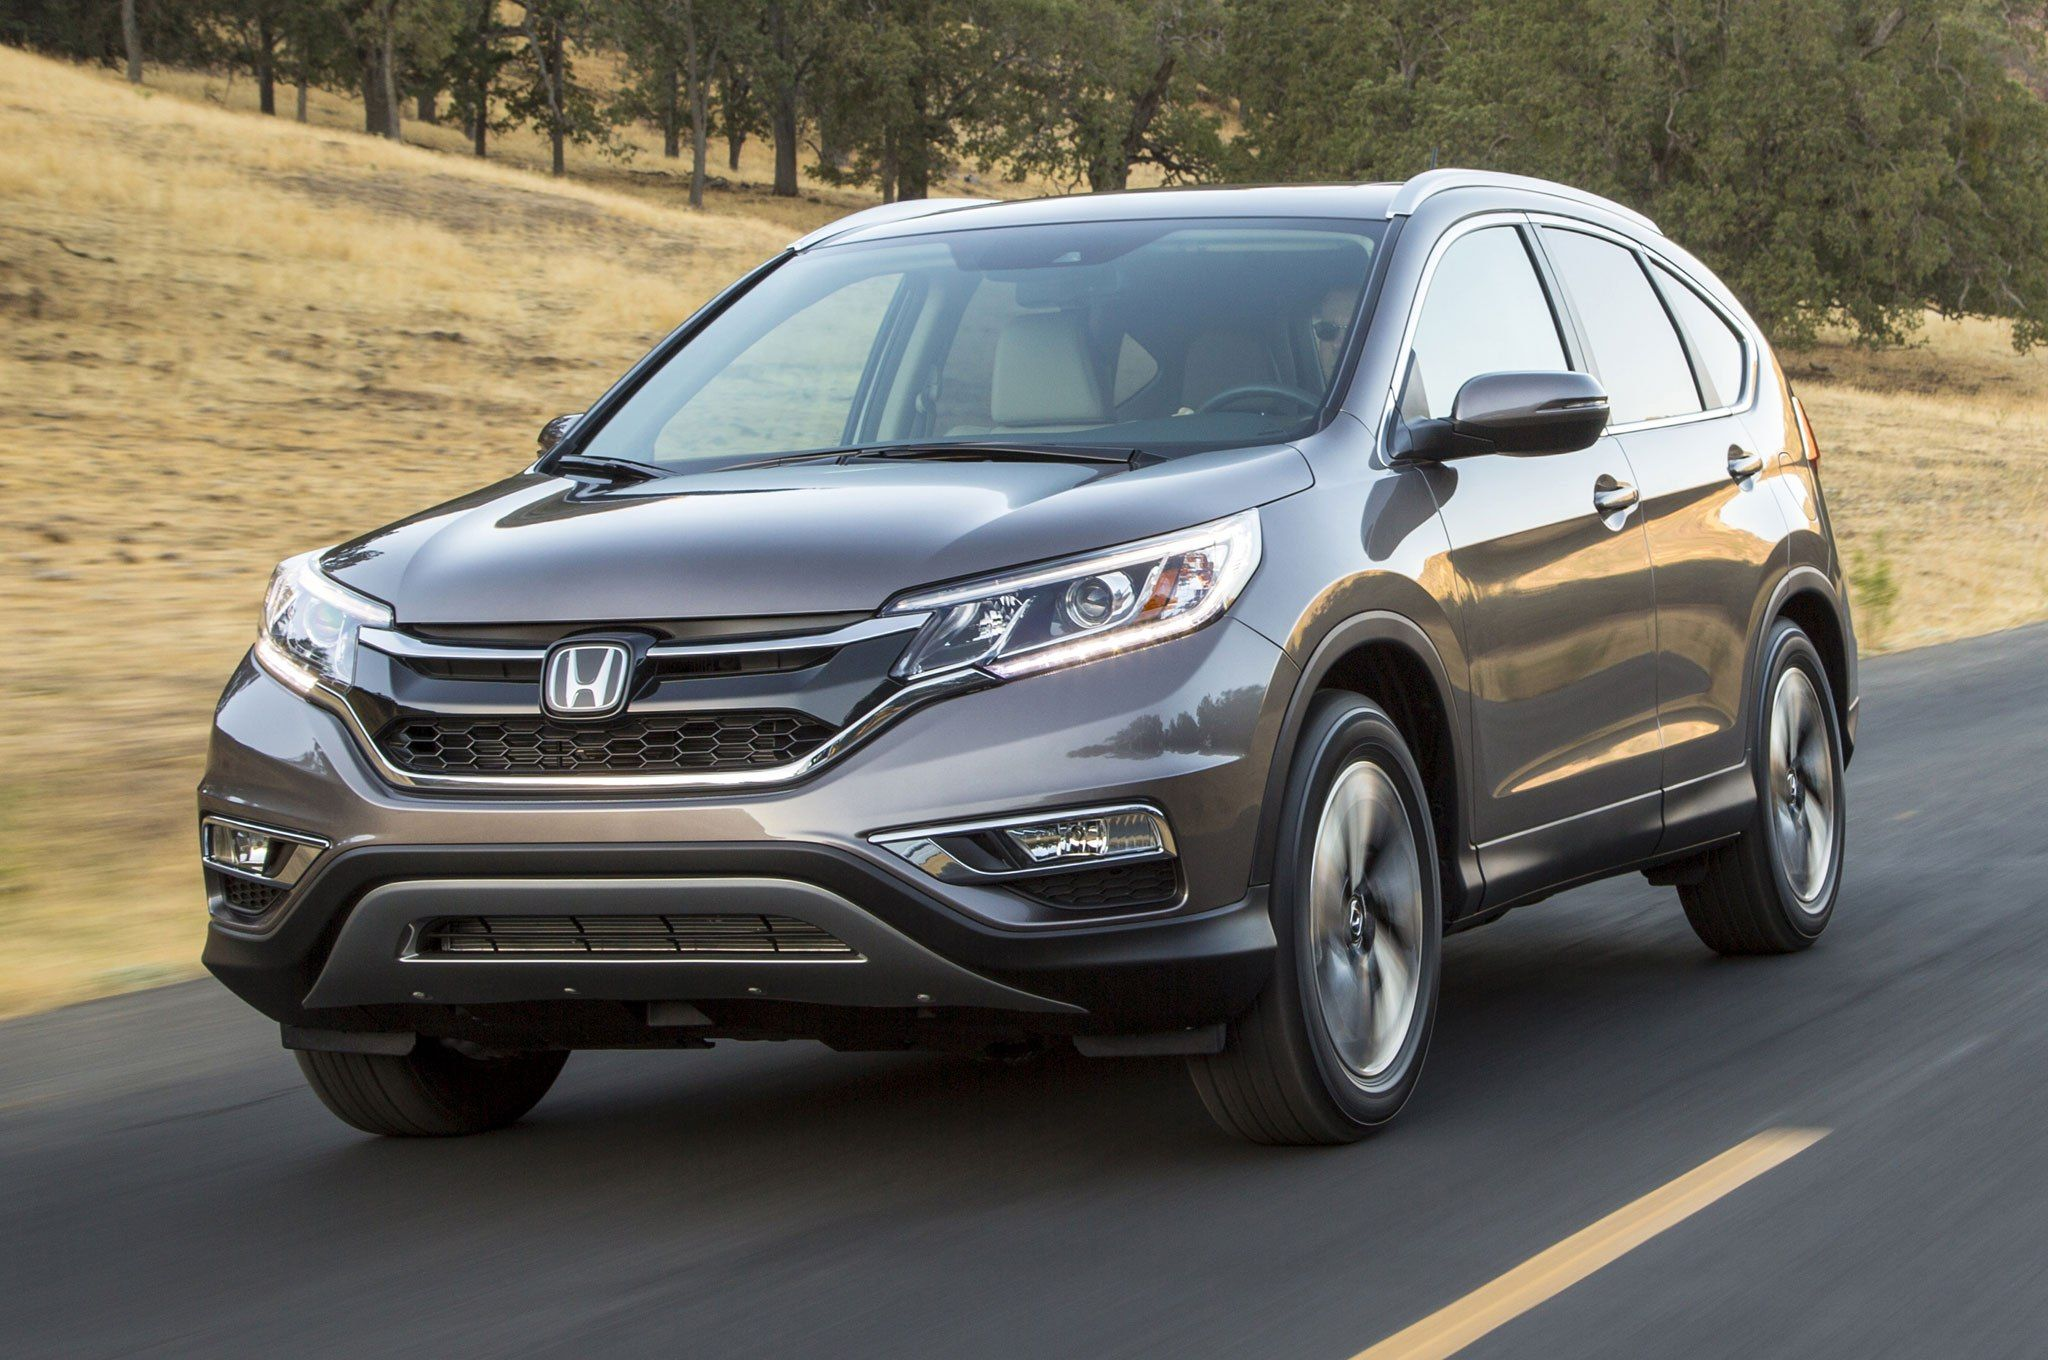 research cr reviews motoring drive v review crv honda first car